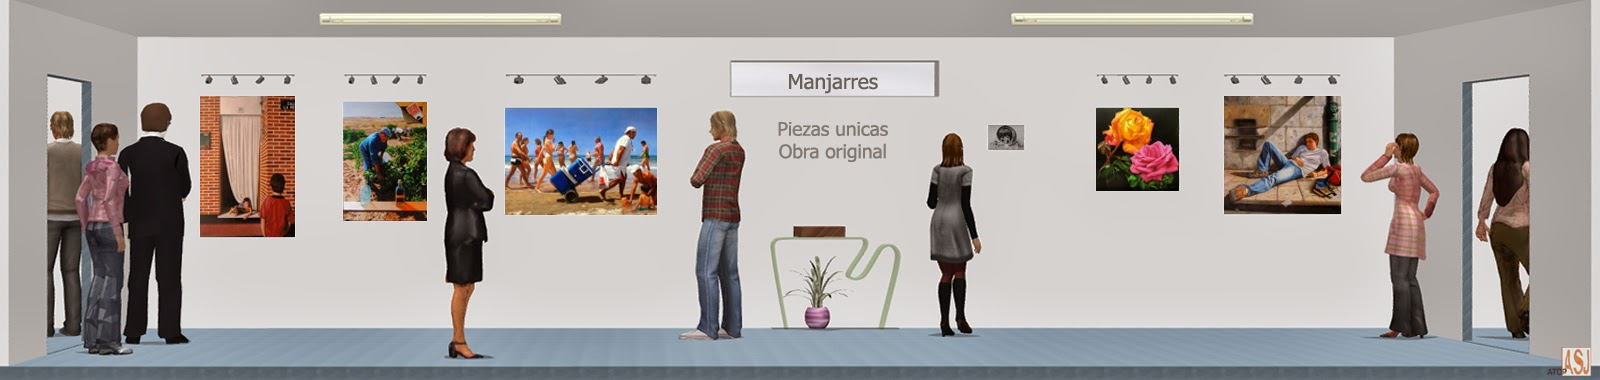 "<img src=""http://1.bp.blogspot.com/-twGeZa21mv0/U33R5jveuZI/AAAAAAAAYyo/GyCCQvzTpFc/s1600/sala_de_exposicion_de_manjarres.jpg"" alt="" Sala de exposición virtual de pinturas y retratos de Manjarrés""/>"